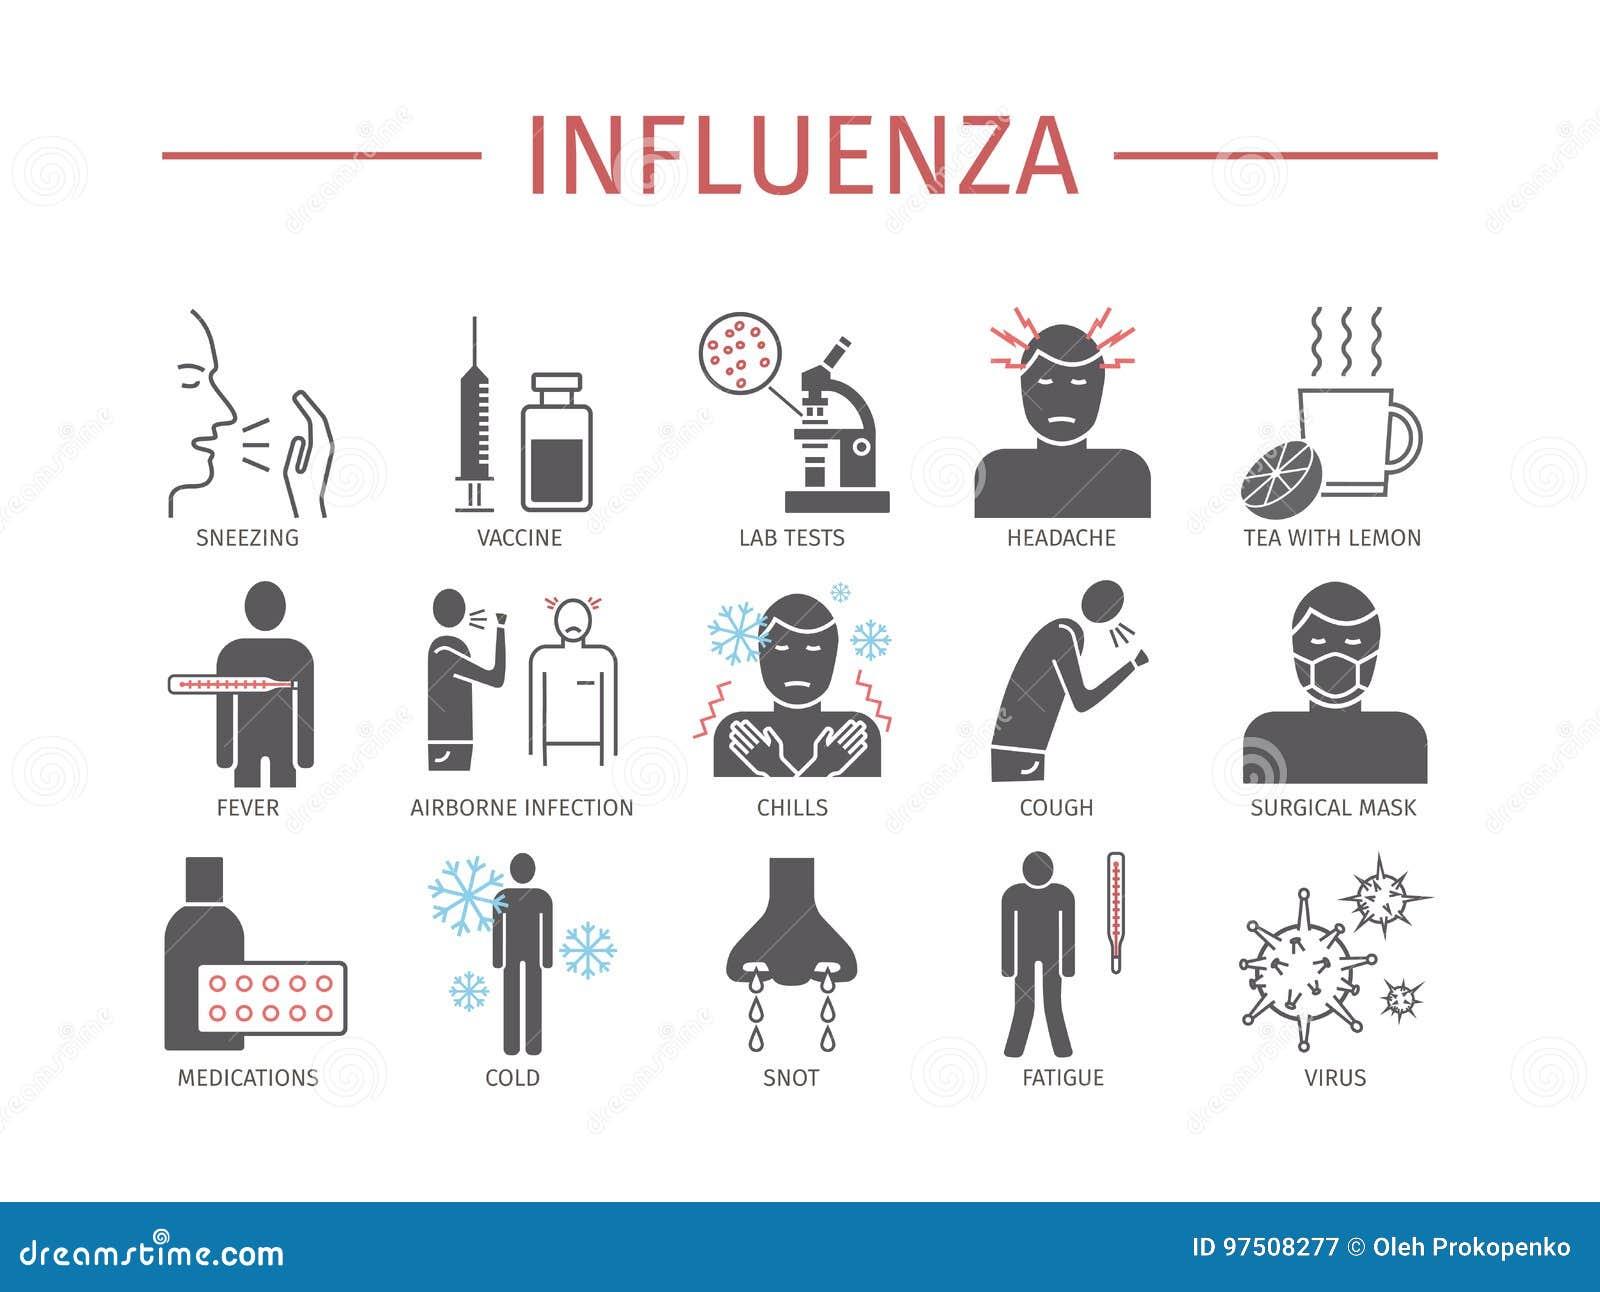 influenza flu symptoms treatment flat icons set vector signs